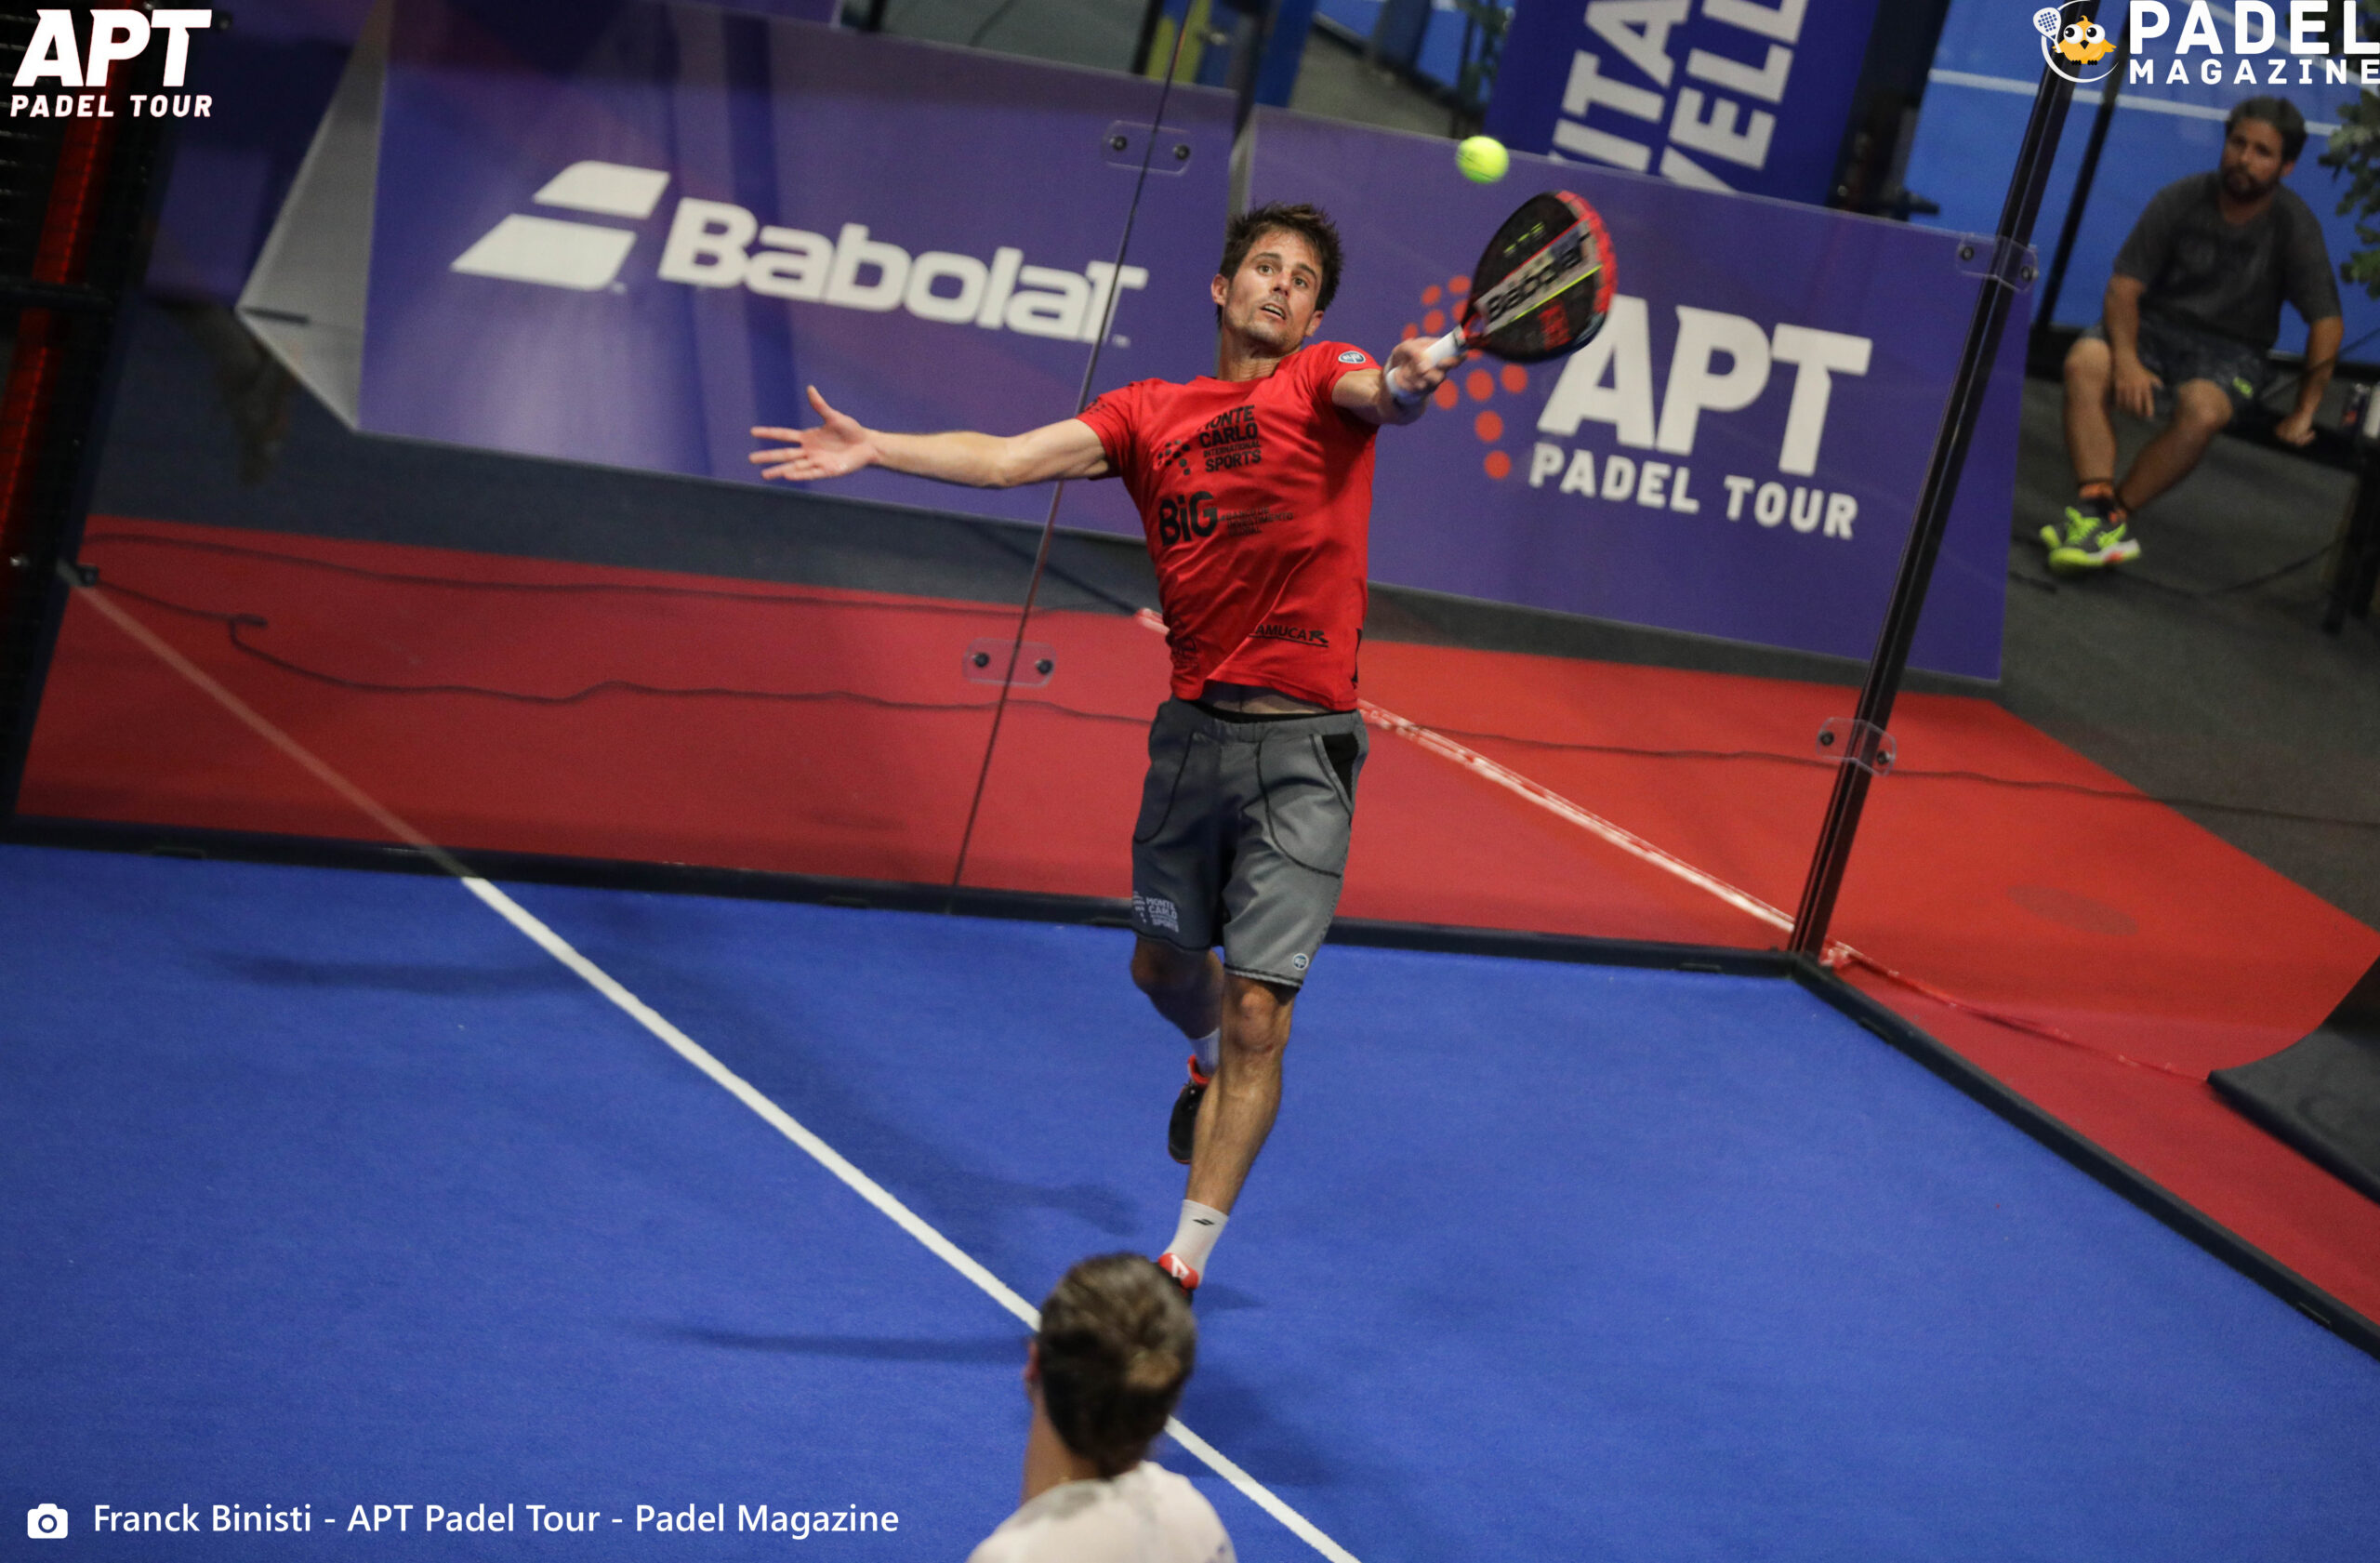 Miguel Oliveira left-handed volley